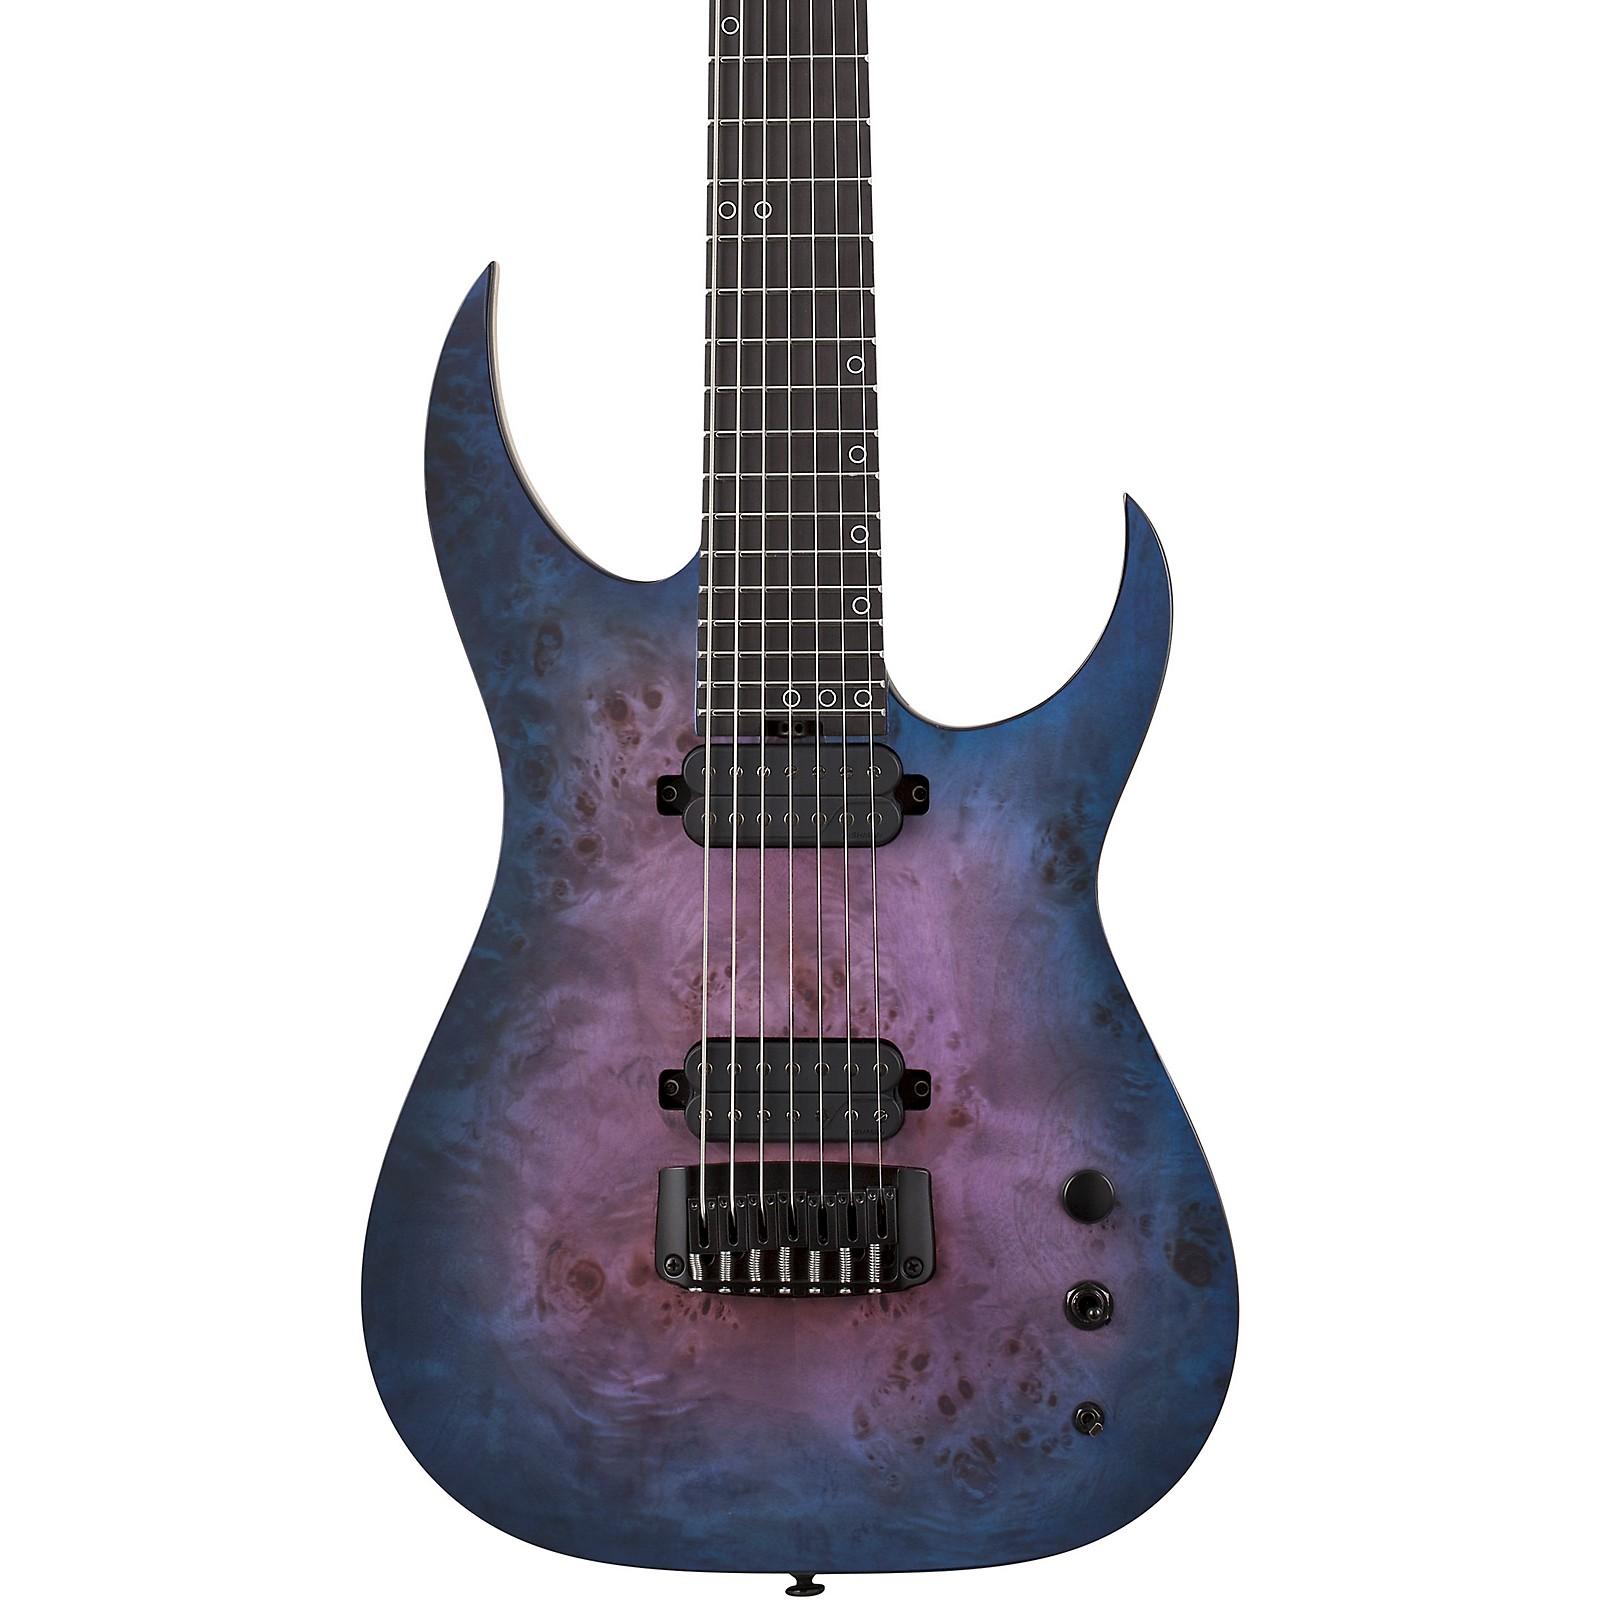 Schecter Guitar Research Keith Merrow KM-7 MK-III Artist 7-String Electric Guitar